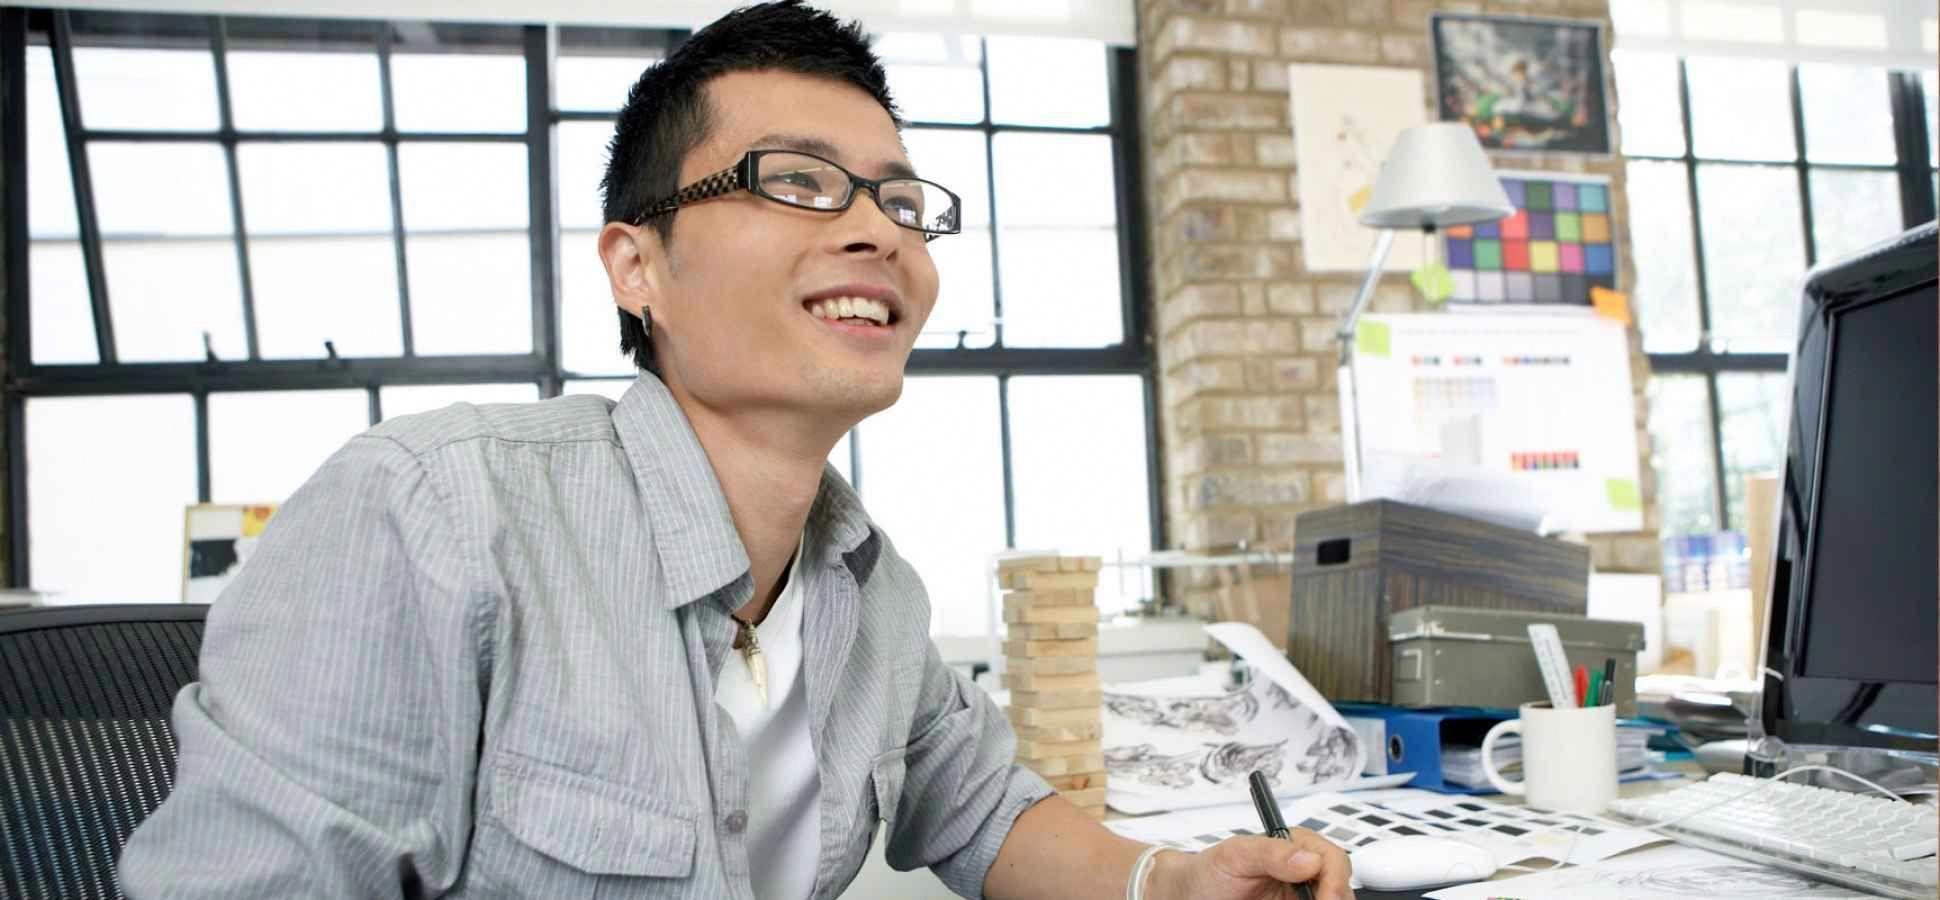 Game Testing for Money Business school, Job perks, Mit sloan